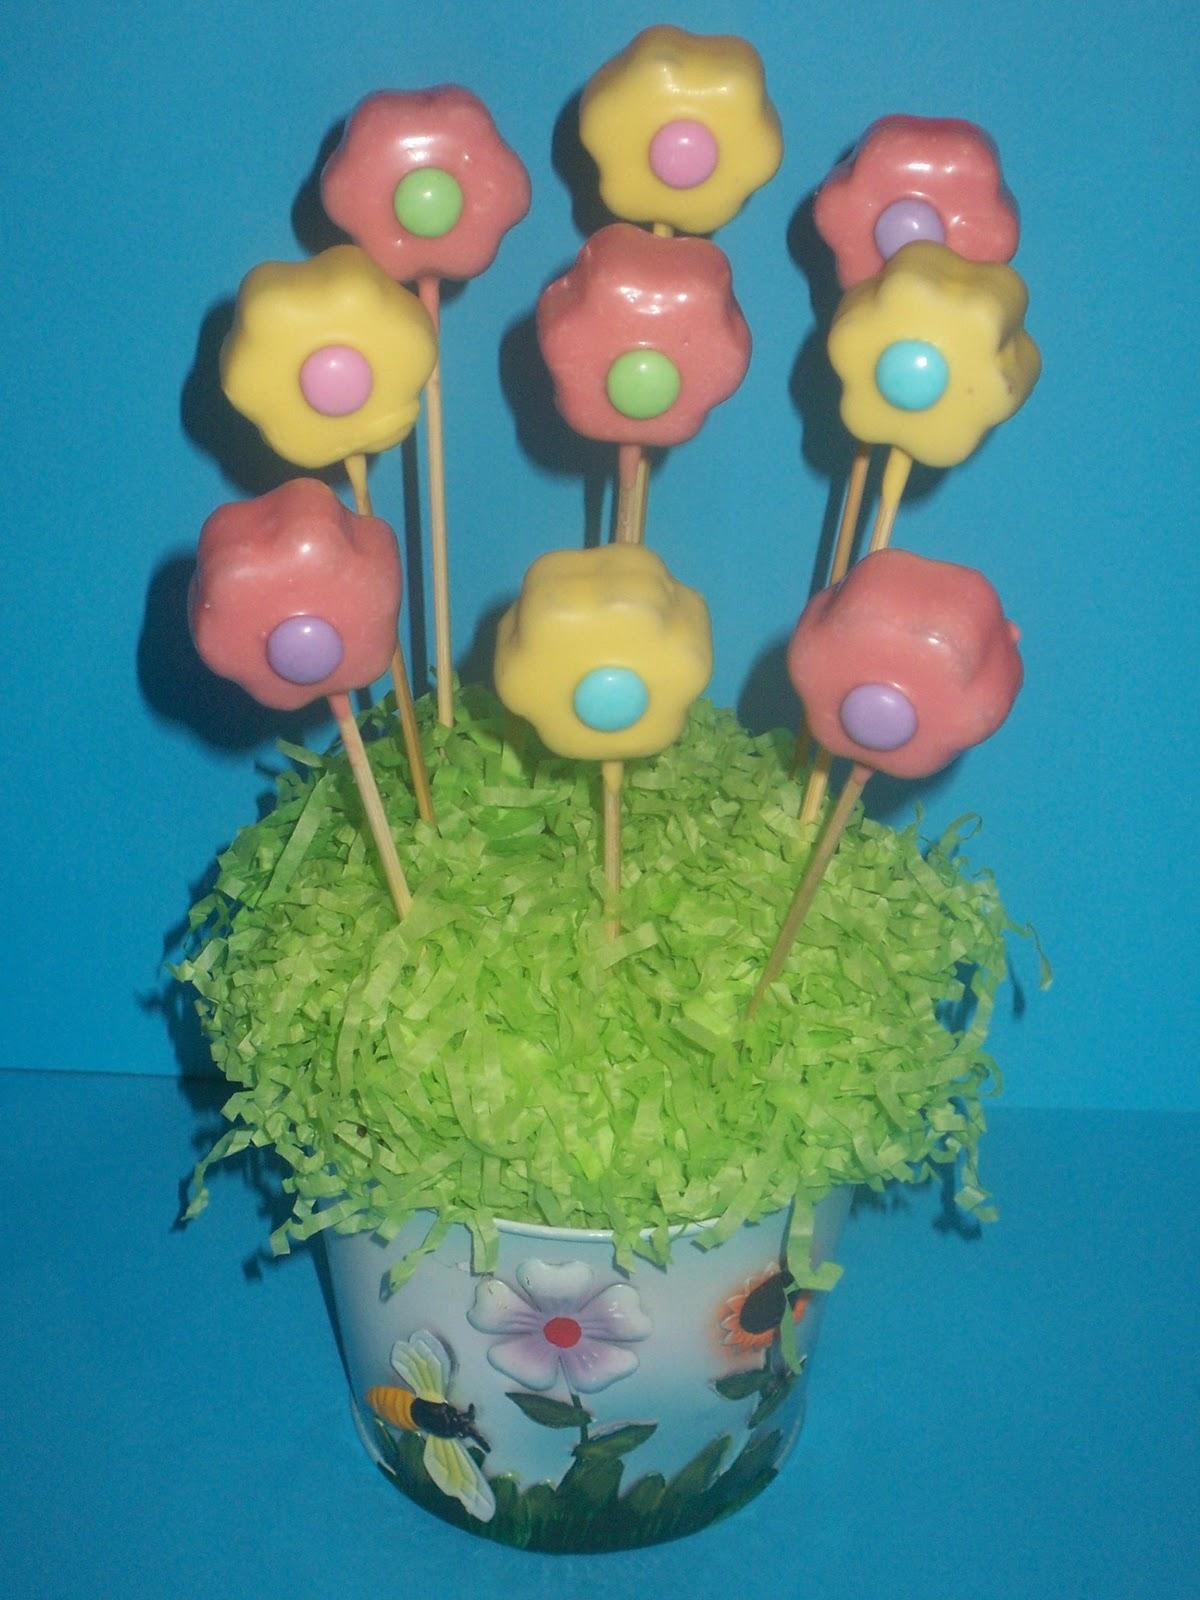 Flower Cake Balls : UNIQUELY CUPCAKED: Flower Cake Pops